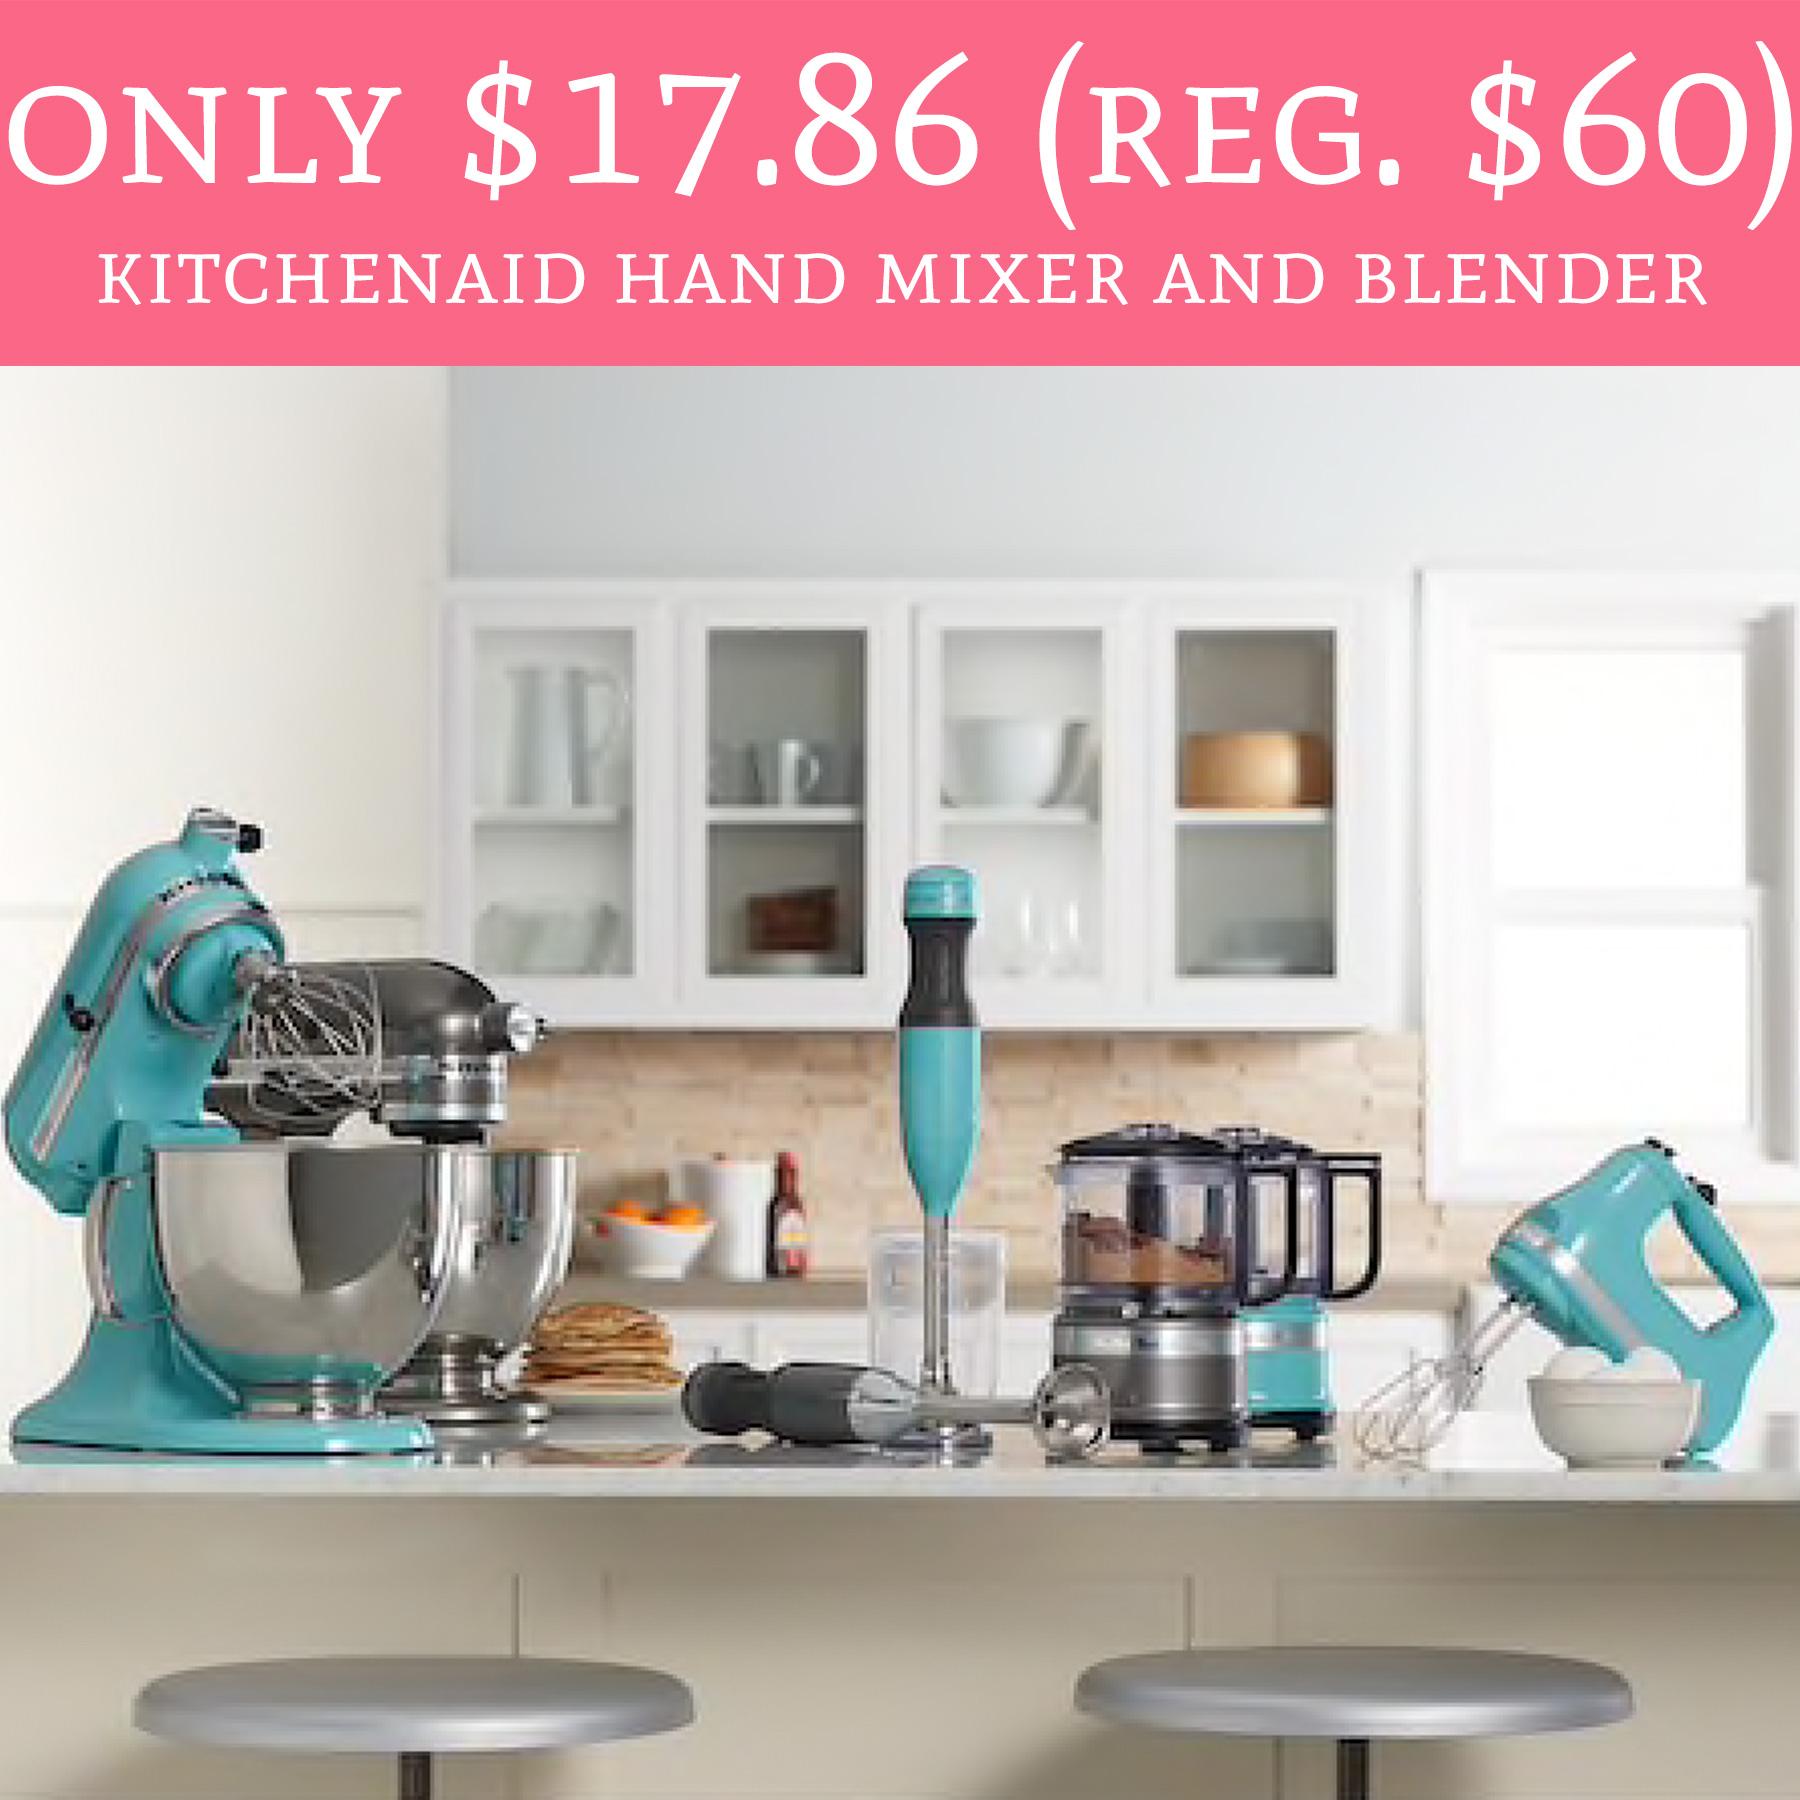 HOT! Only $17.86 (Regular $60) KitchenAid Hand Mixer And Blender ...